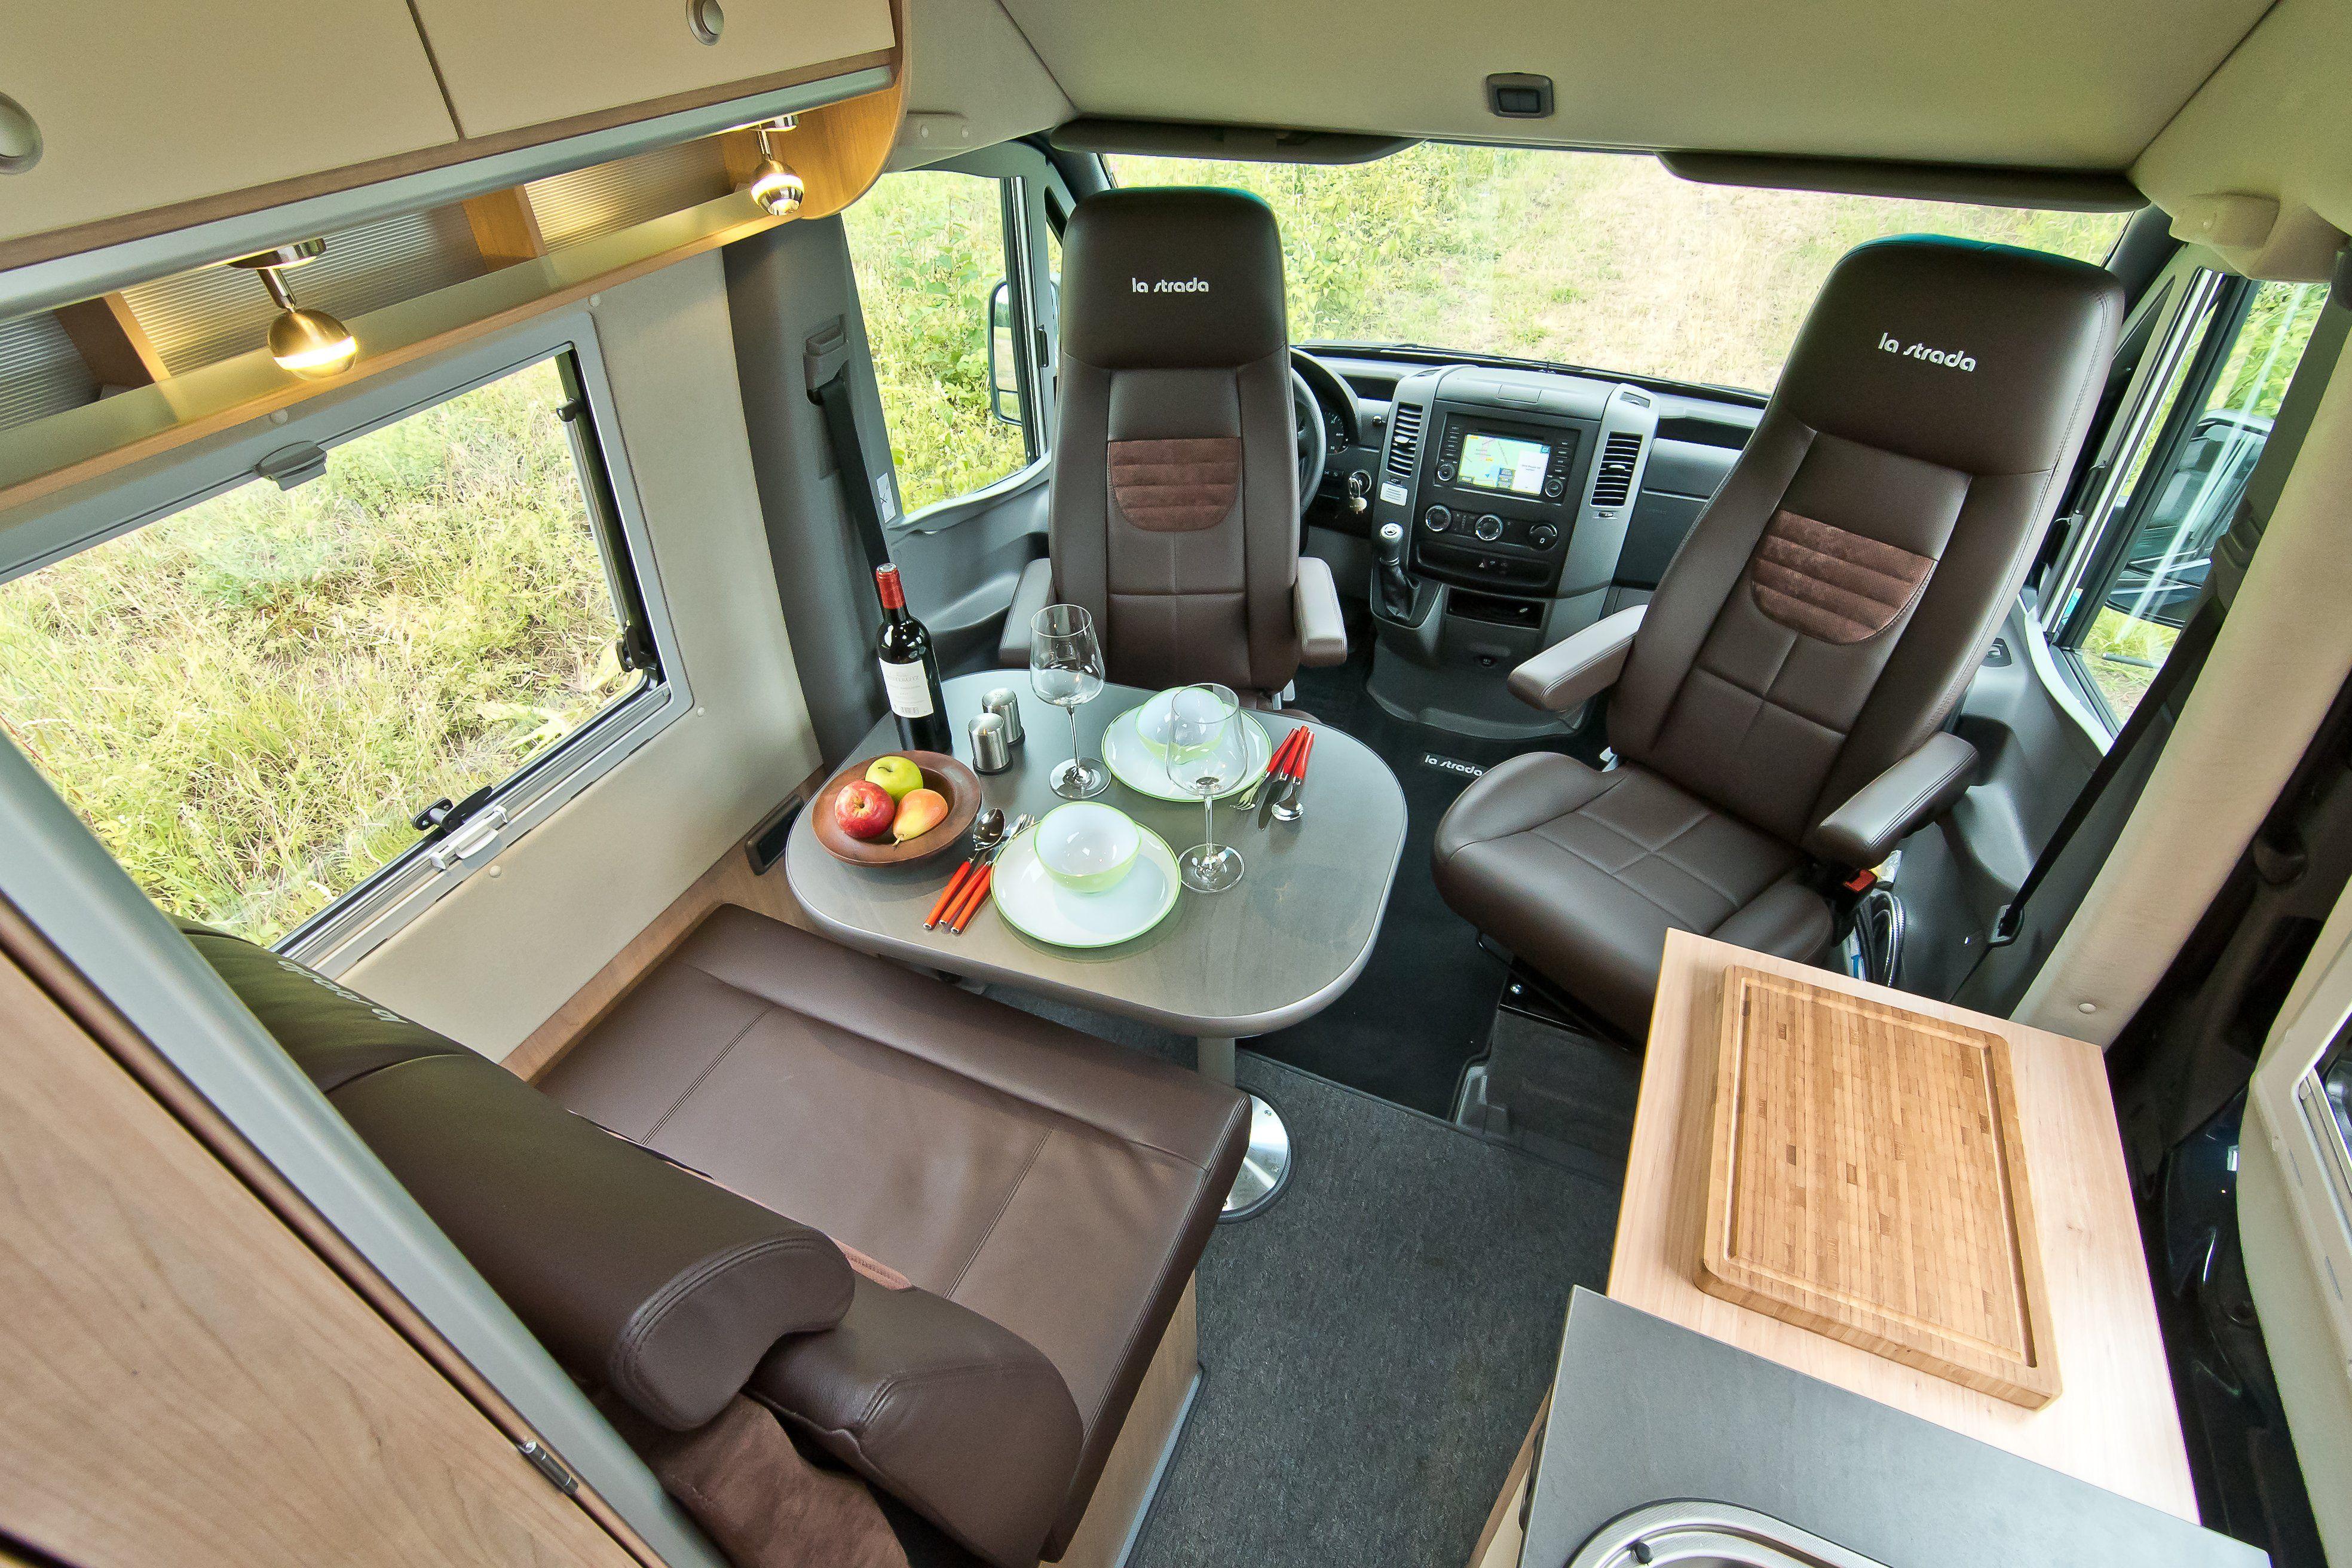 2015 La Strada Regent S 4x4 Fiat Motorhome Camper Van